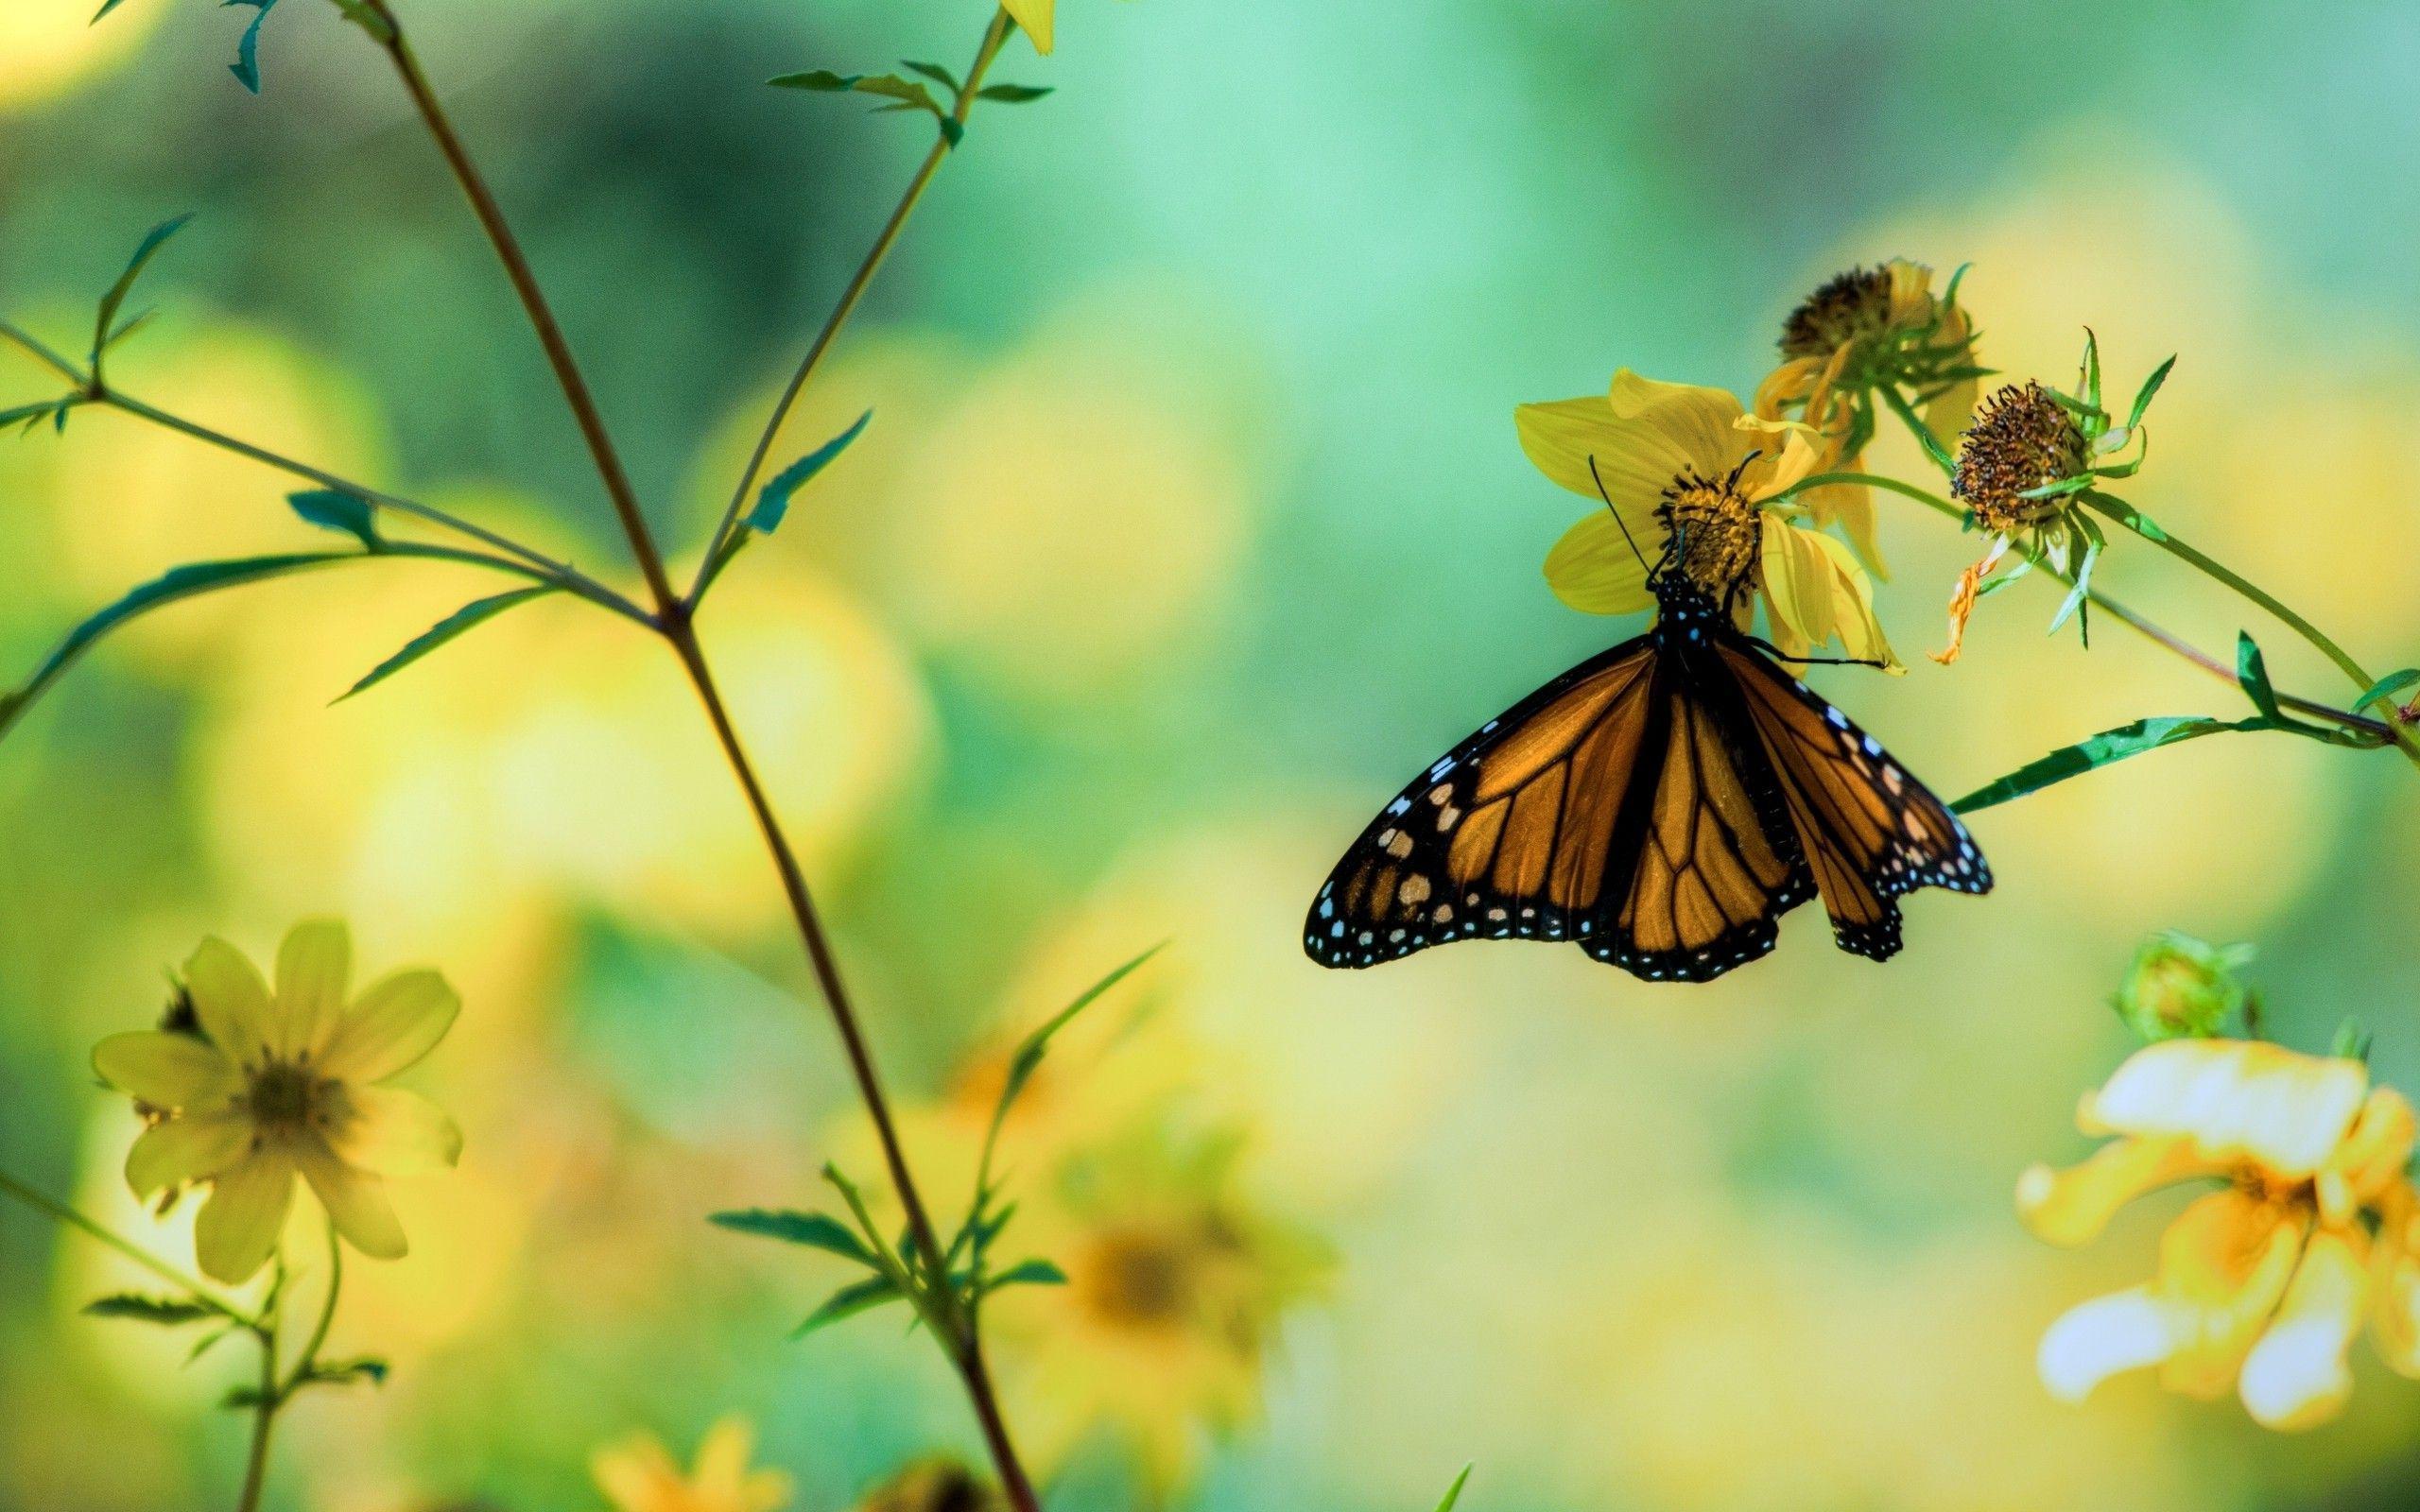 Butterfly Garden Wallpapers Top Free Butterfly Garden